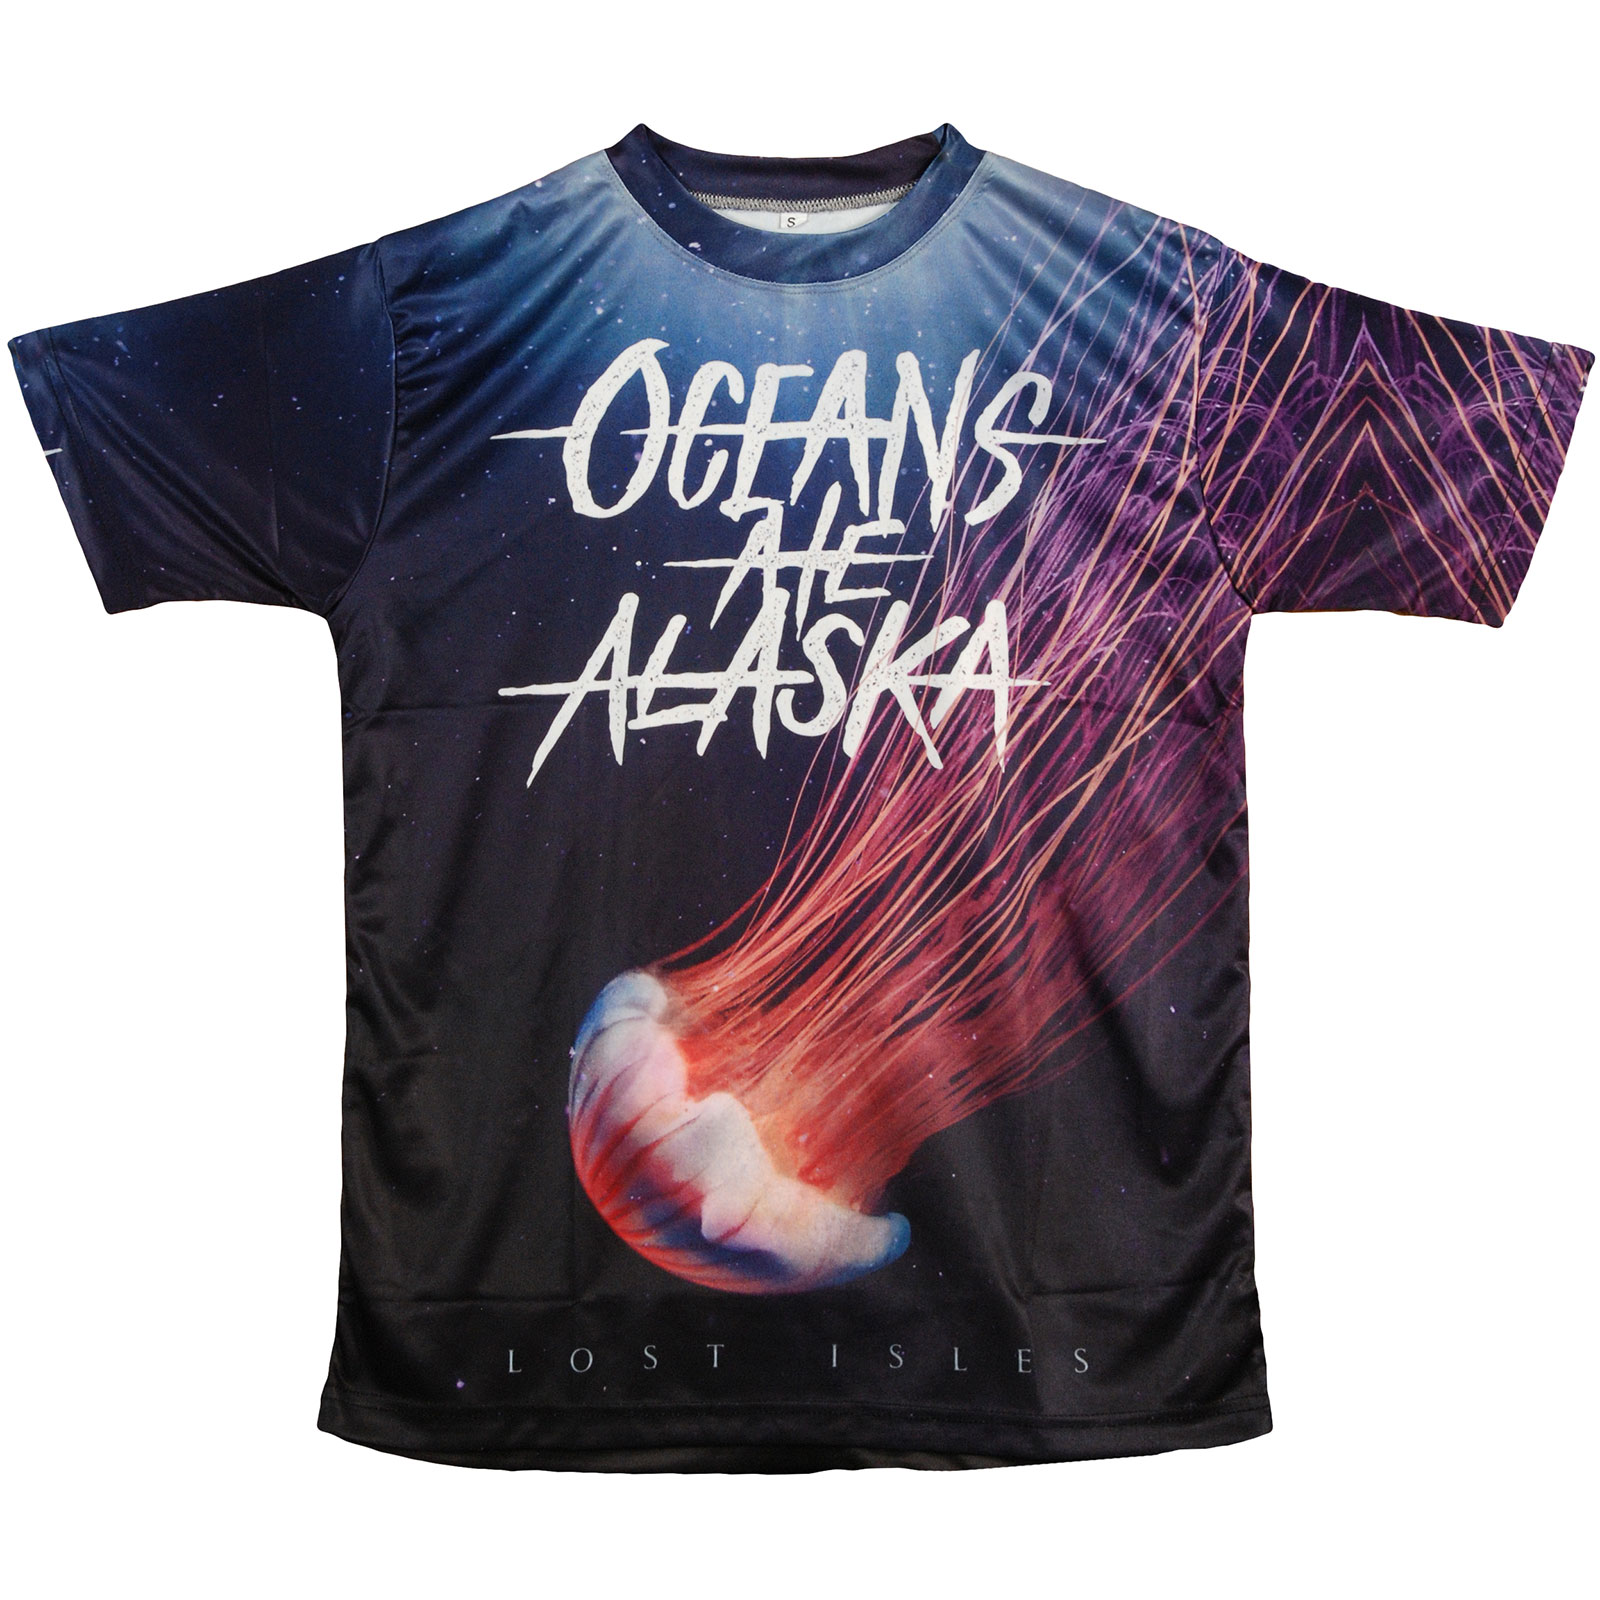 Oceans Ate Alaska Oceans Ate Alaska Mens Lost Isles Sublimation T